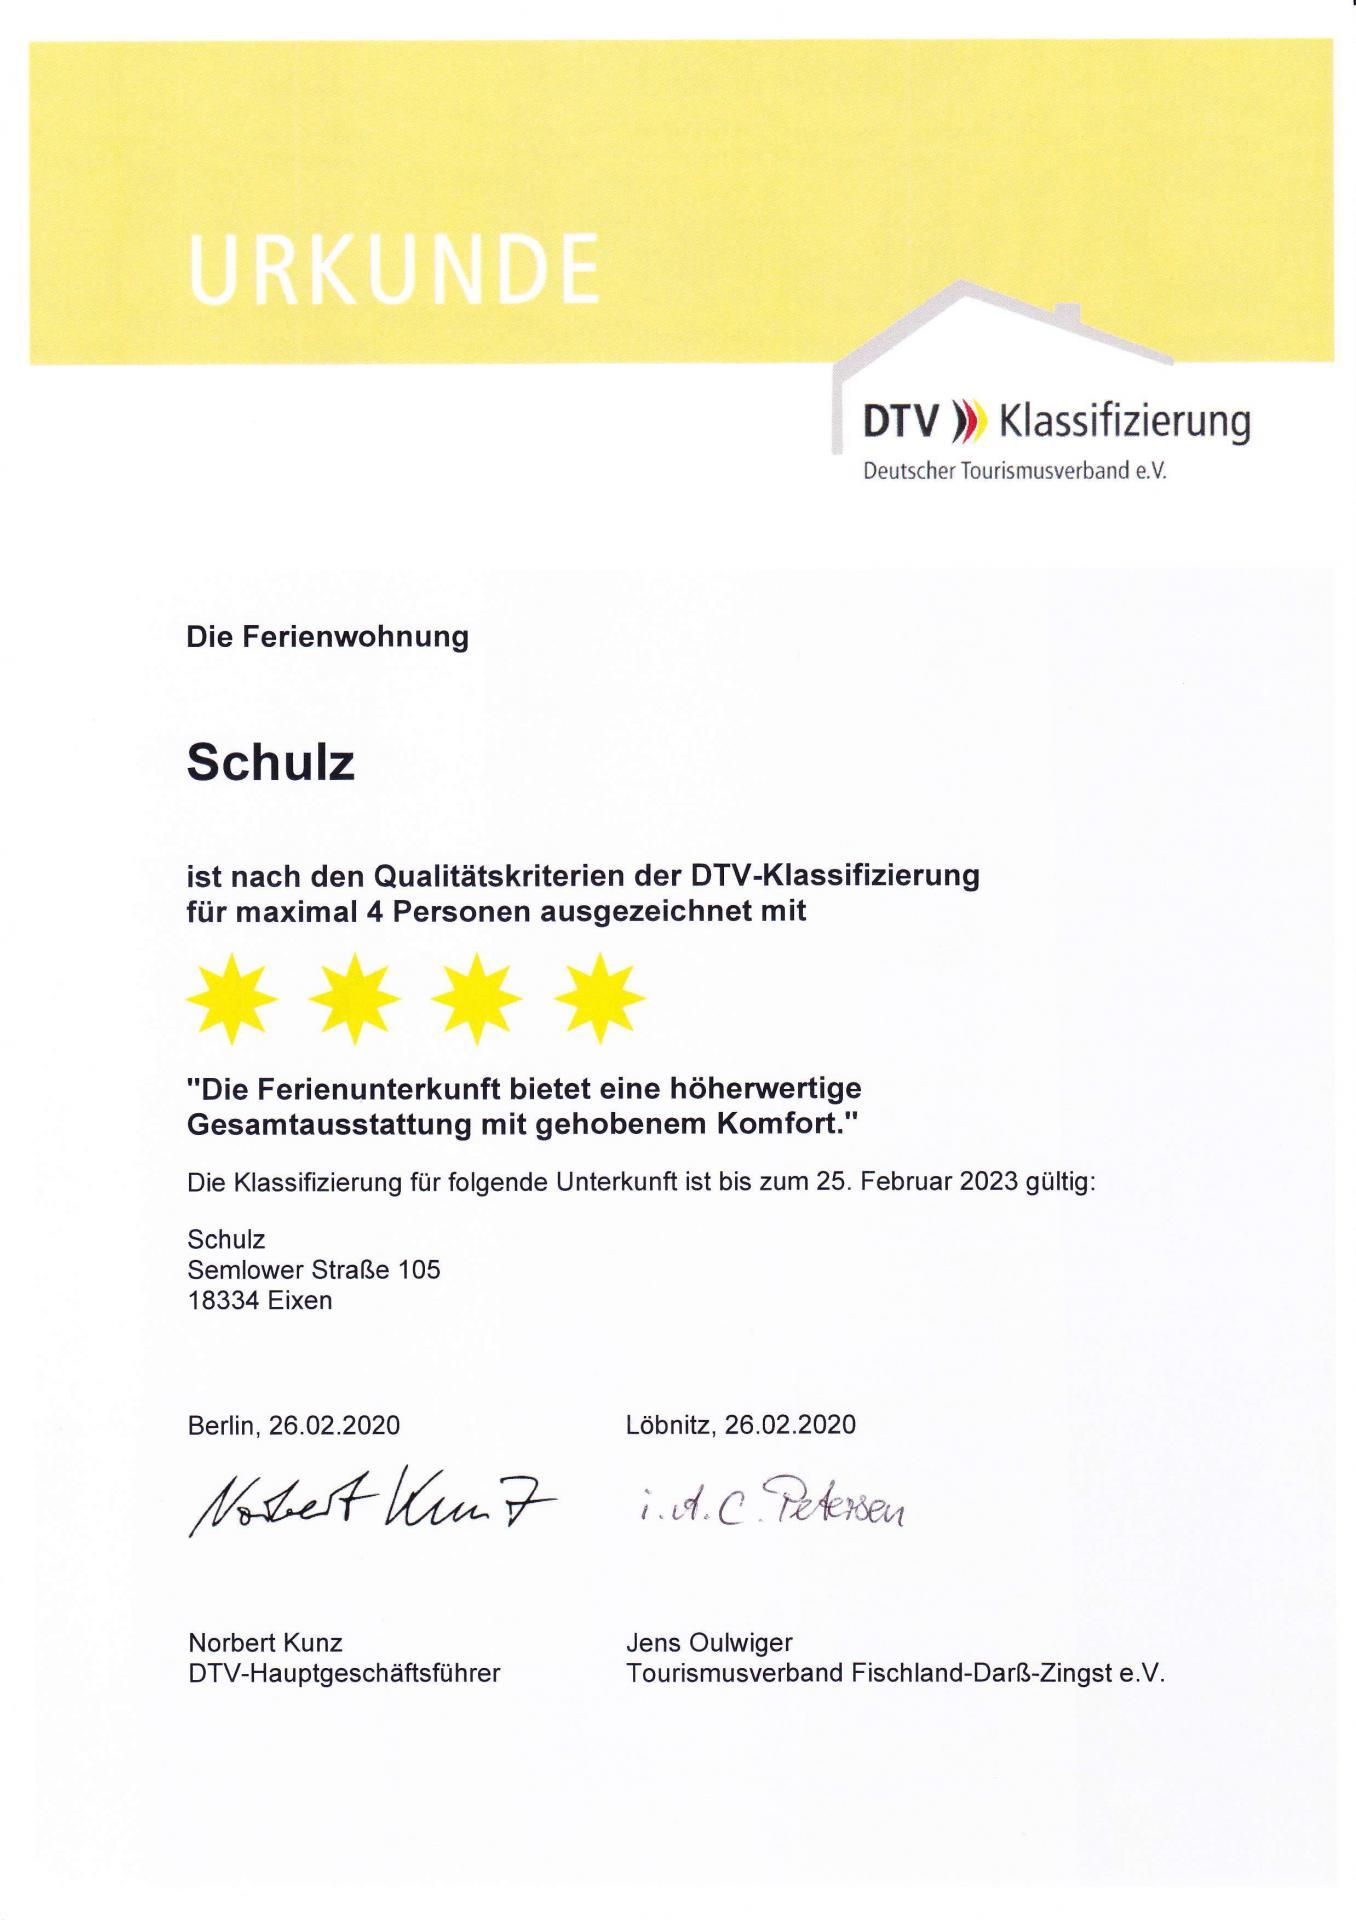 Feriewohnung Schulz Eixen - Klassifizierung